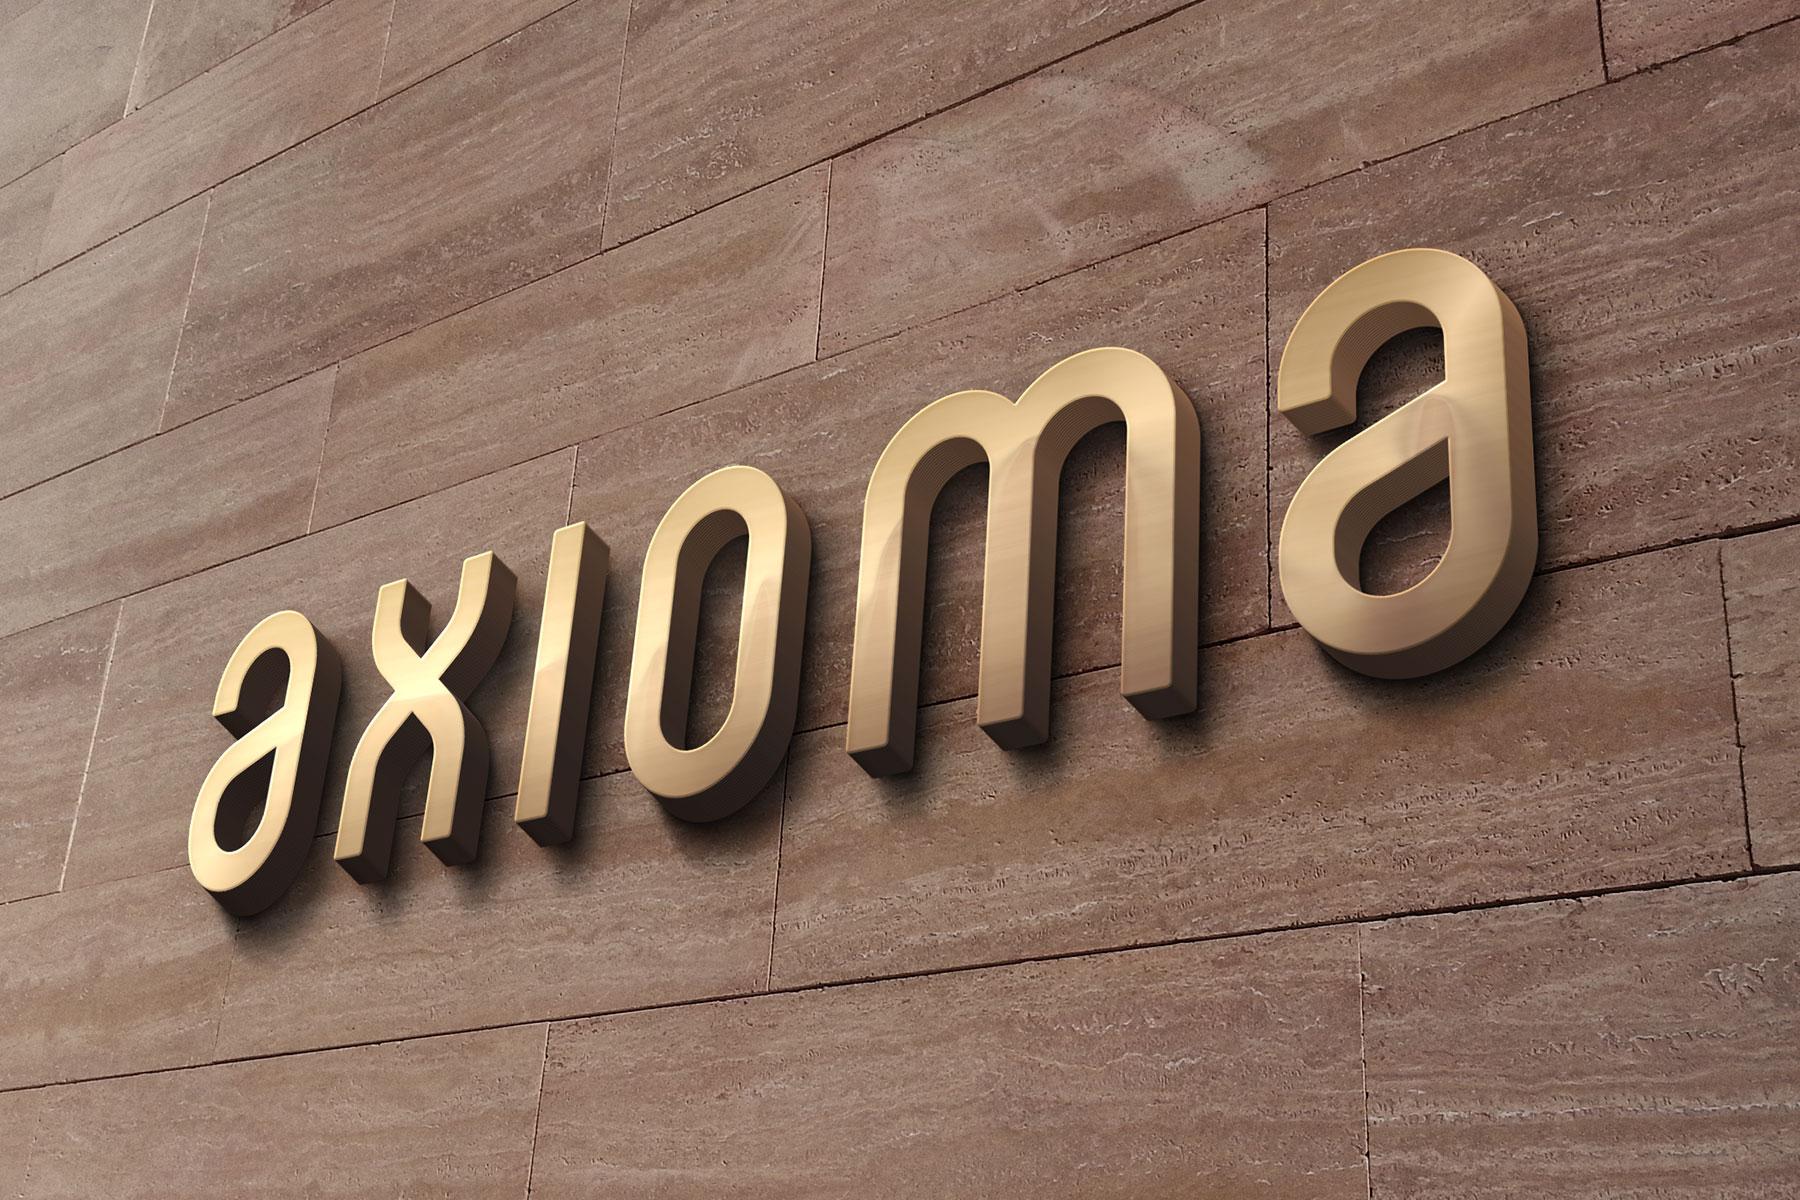 Axioma-signwall.jpg